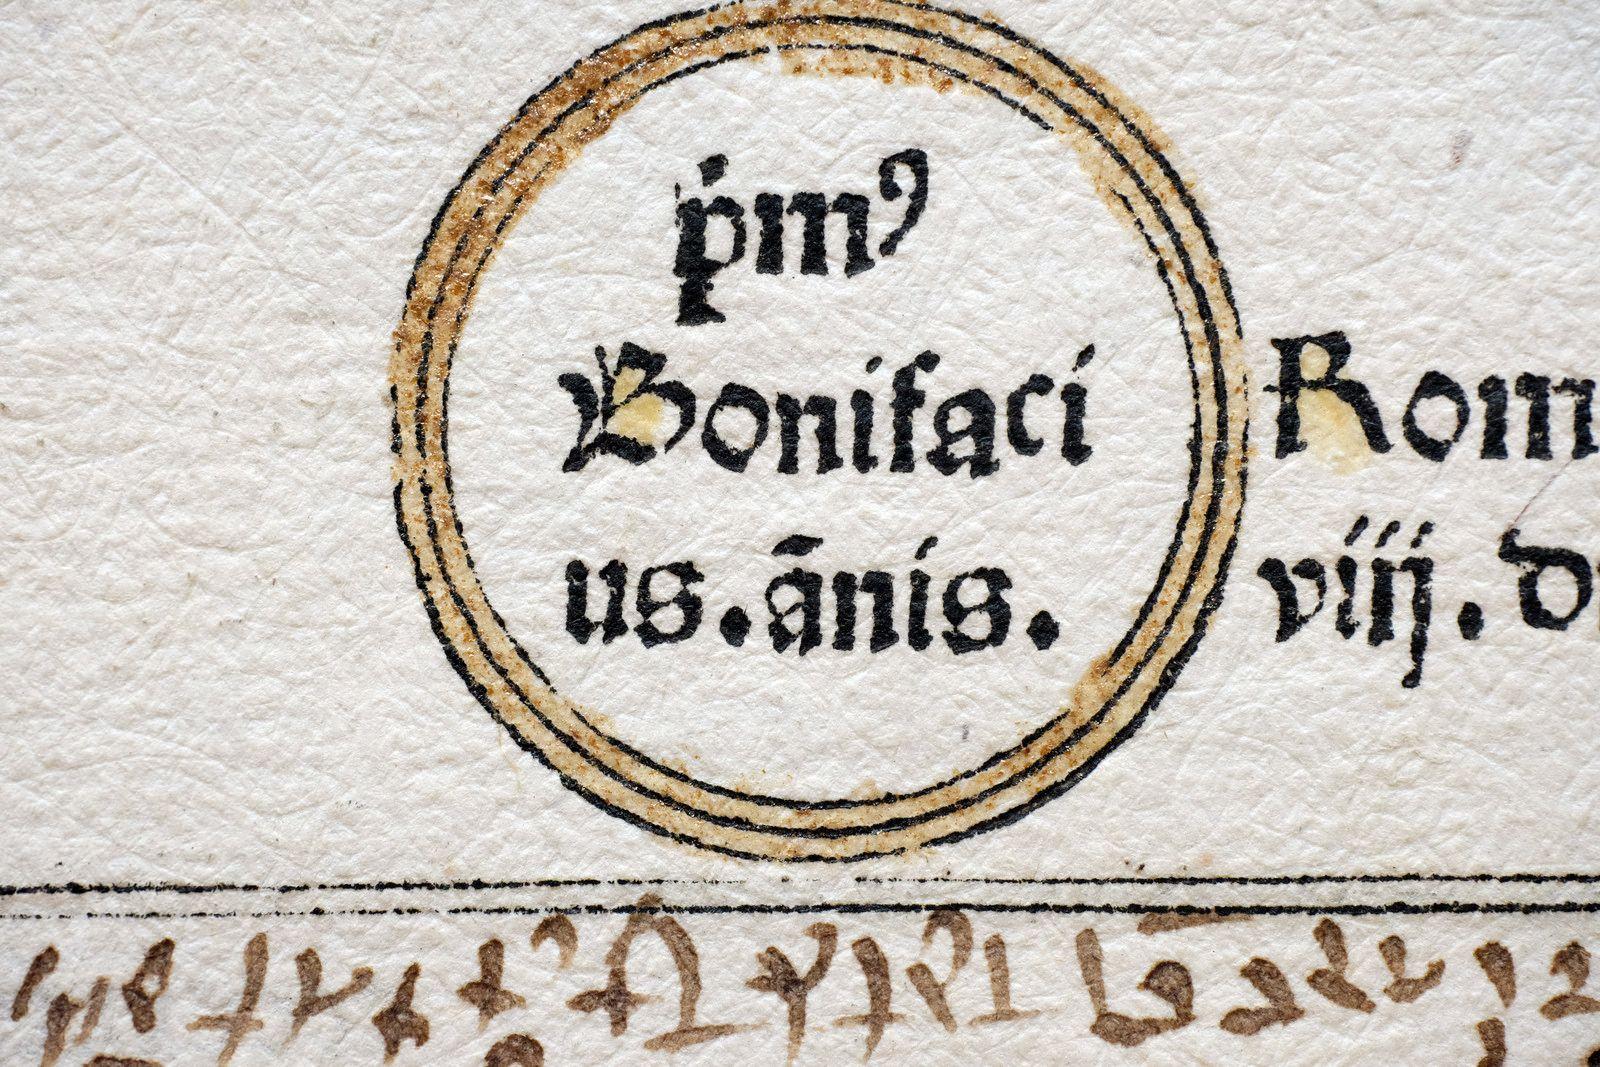 French incunabula rotunda, late 1400s. via Boekwetenschap en Handschriftenkunde Amsterdam